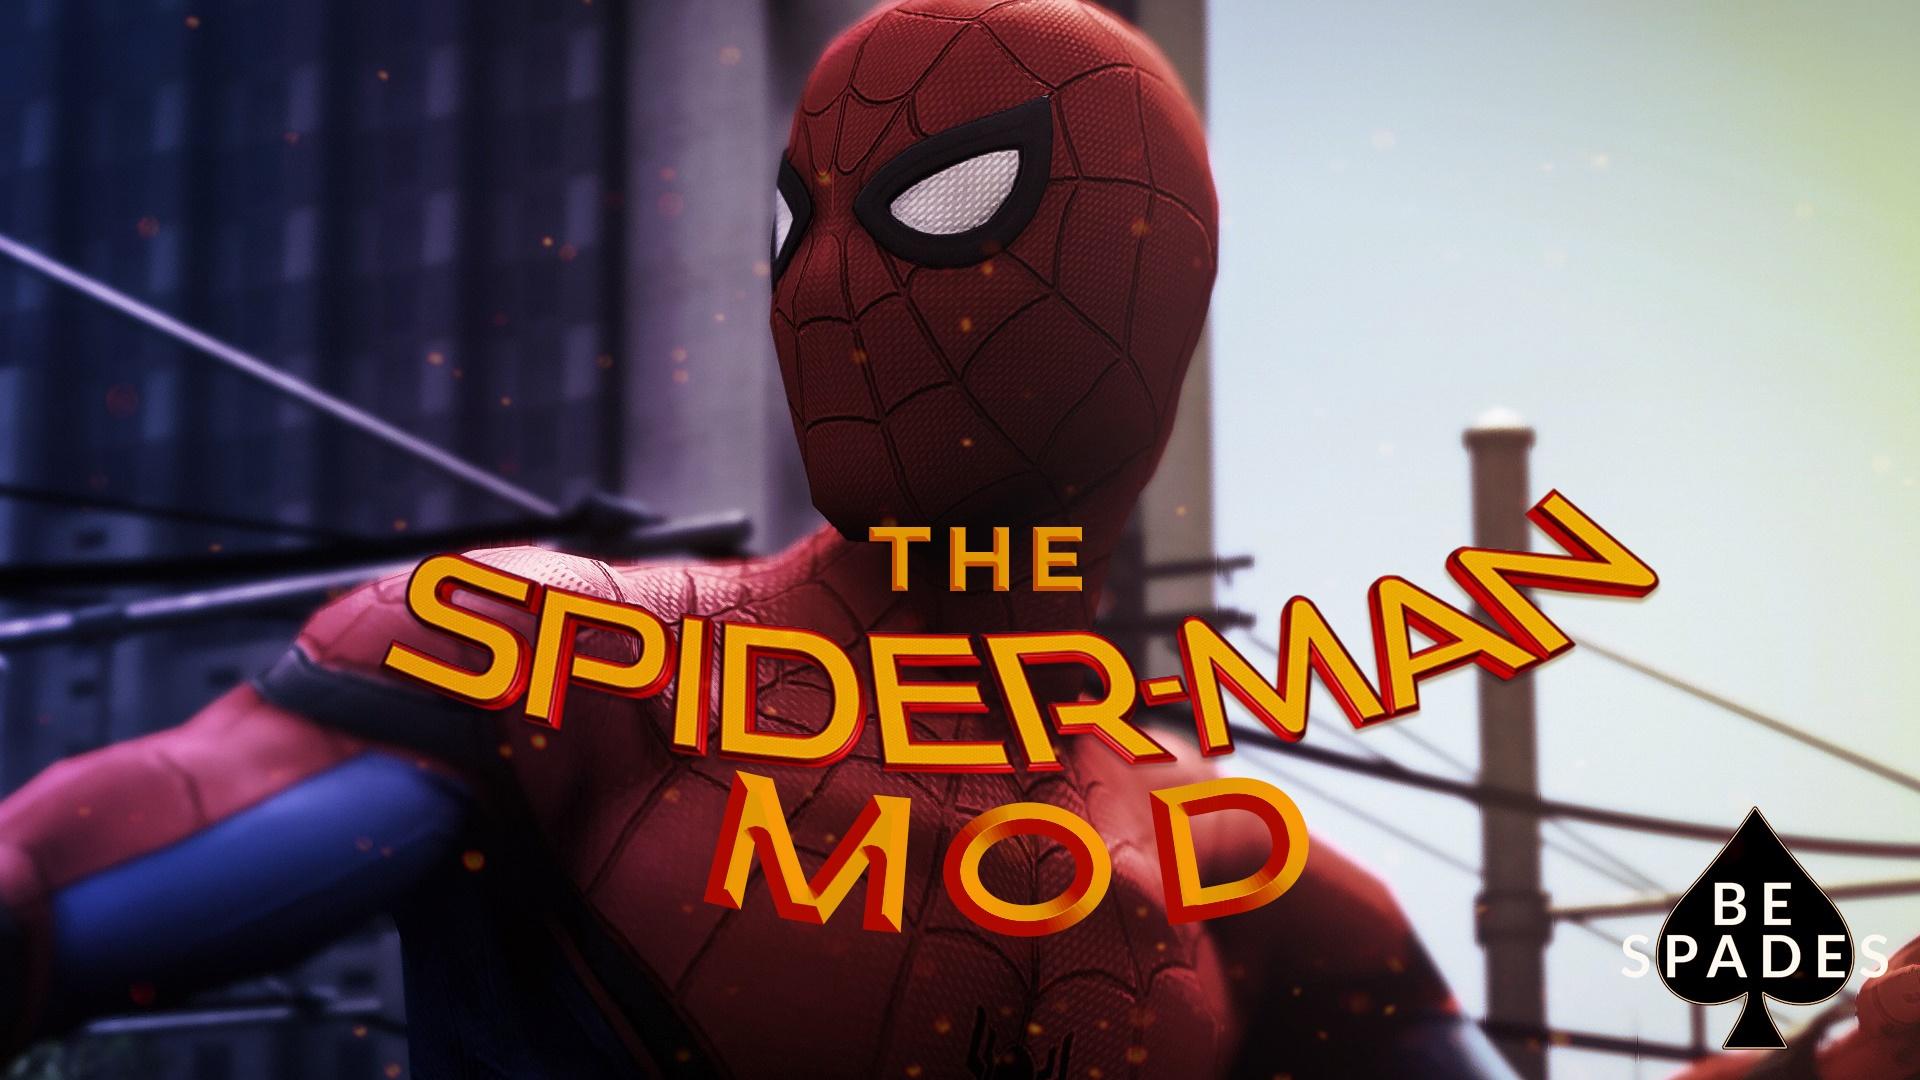 Gta spiderman mod game download free